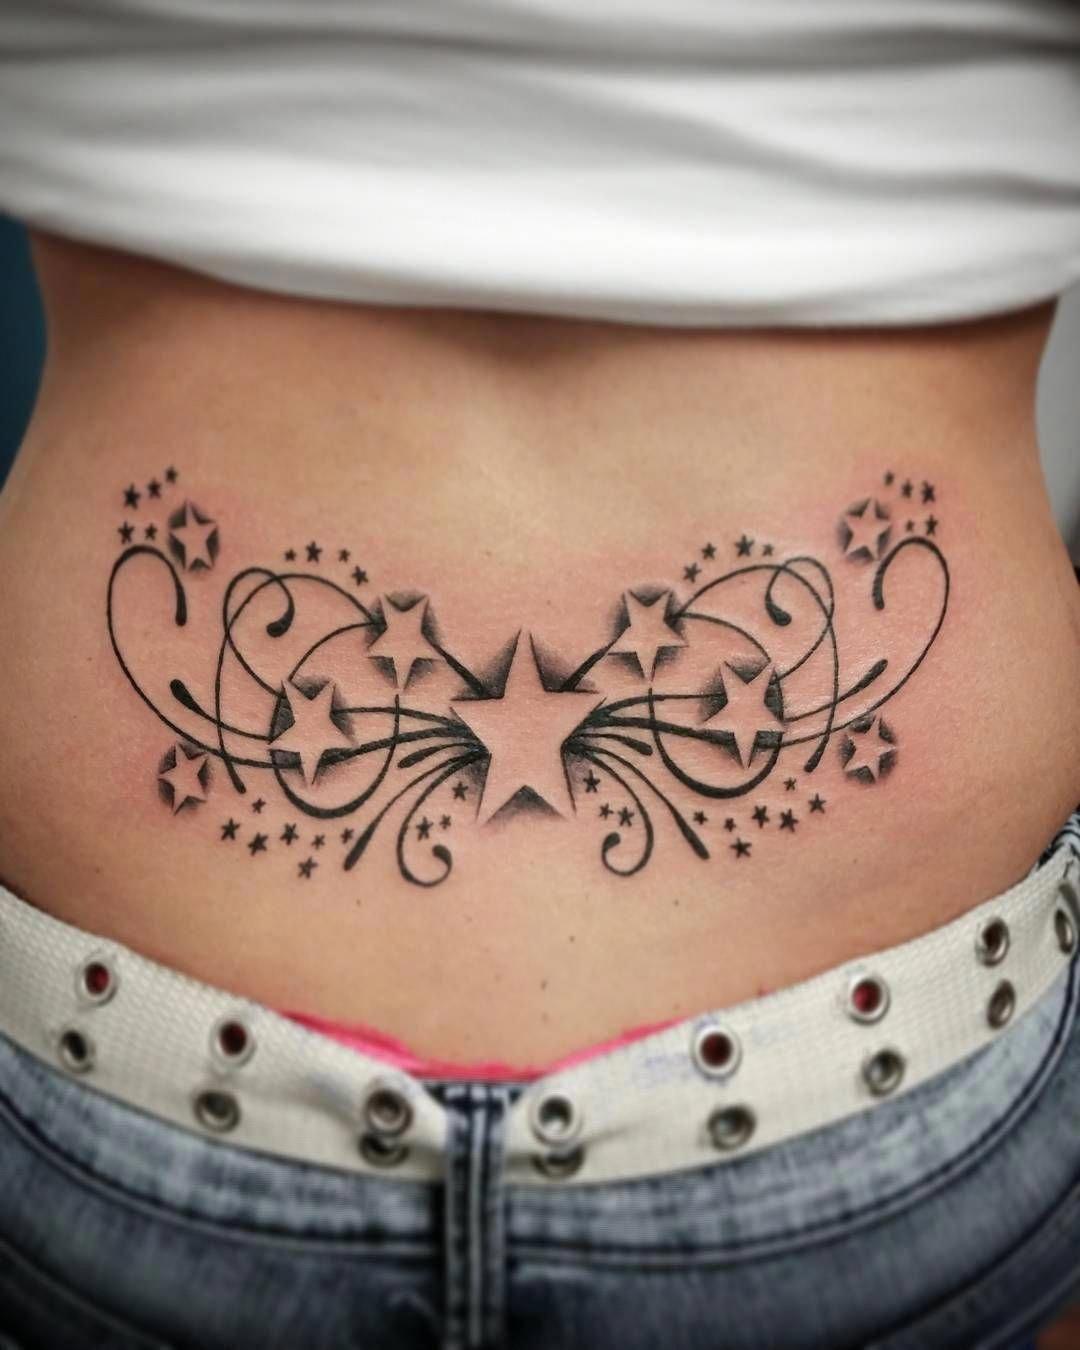 lower abdomen tattoo